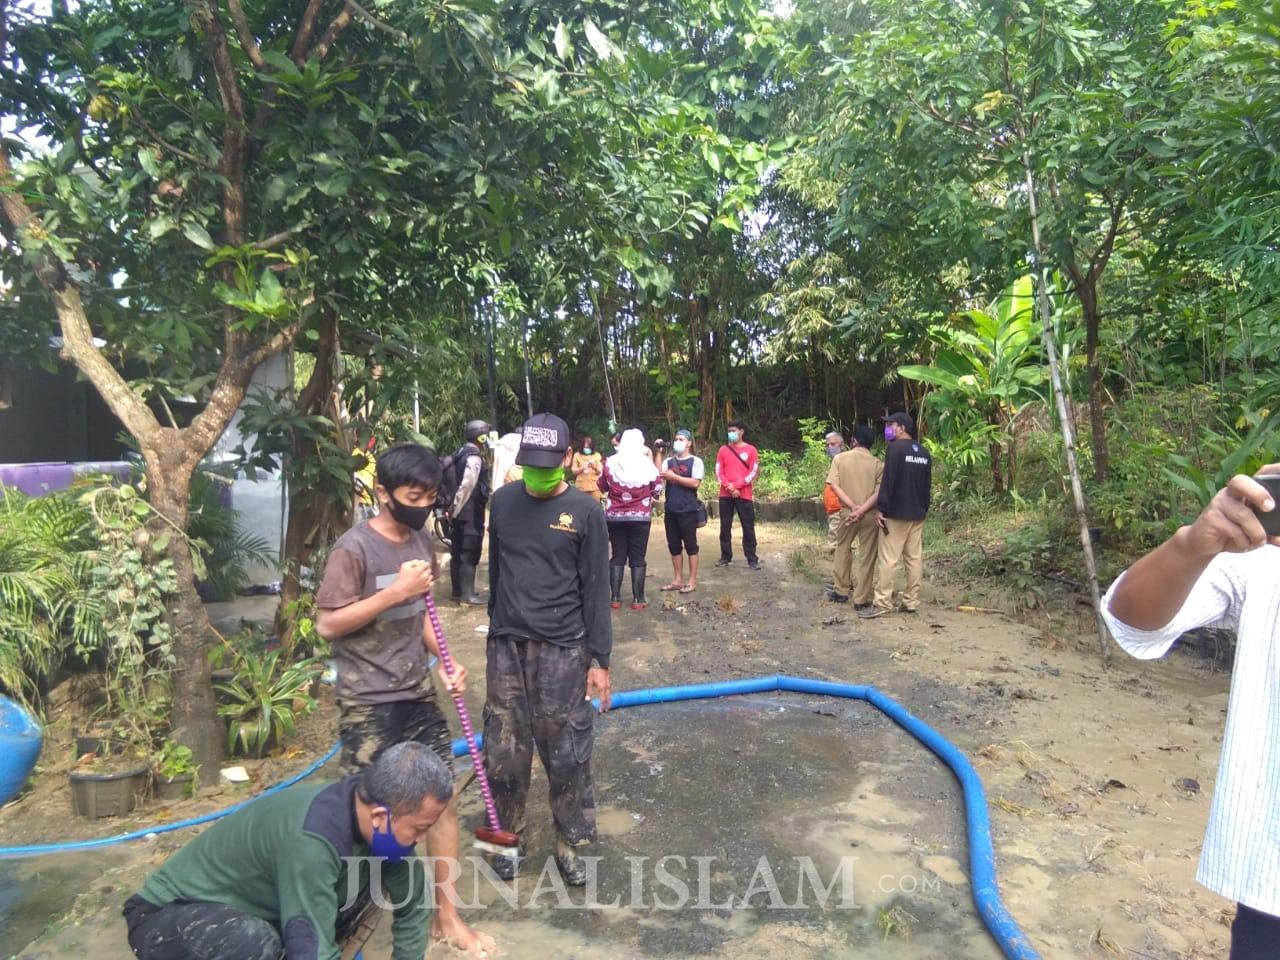 Relawan Jamaah Ansharusy Syariah dan Me-Dan Bantu Korban Banjir Semarang